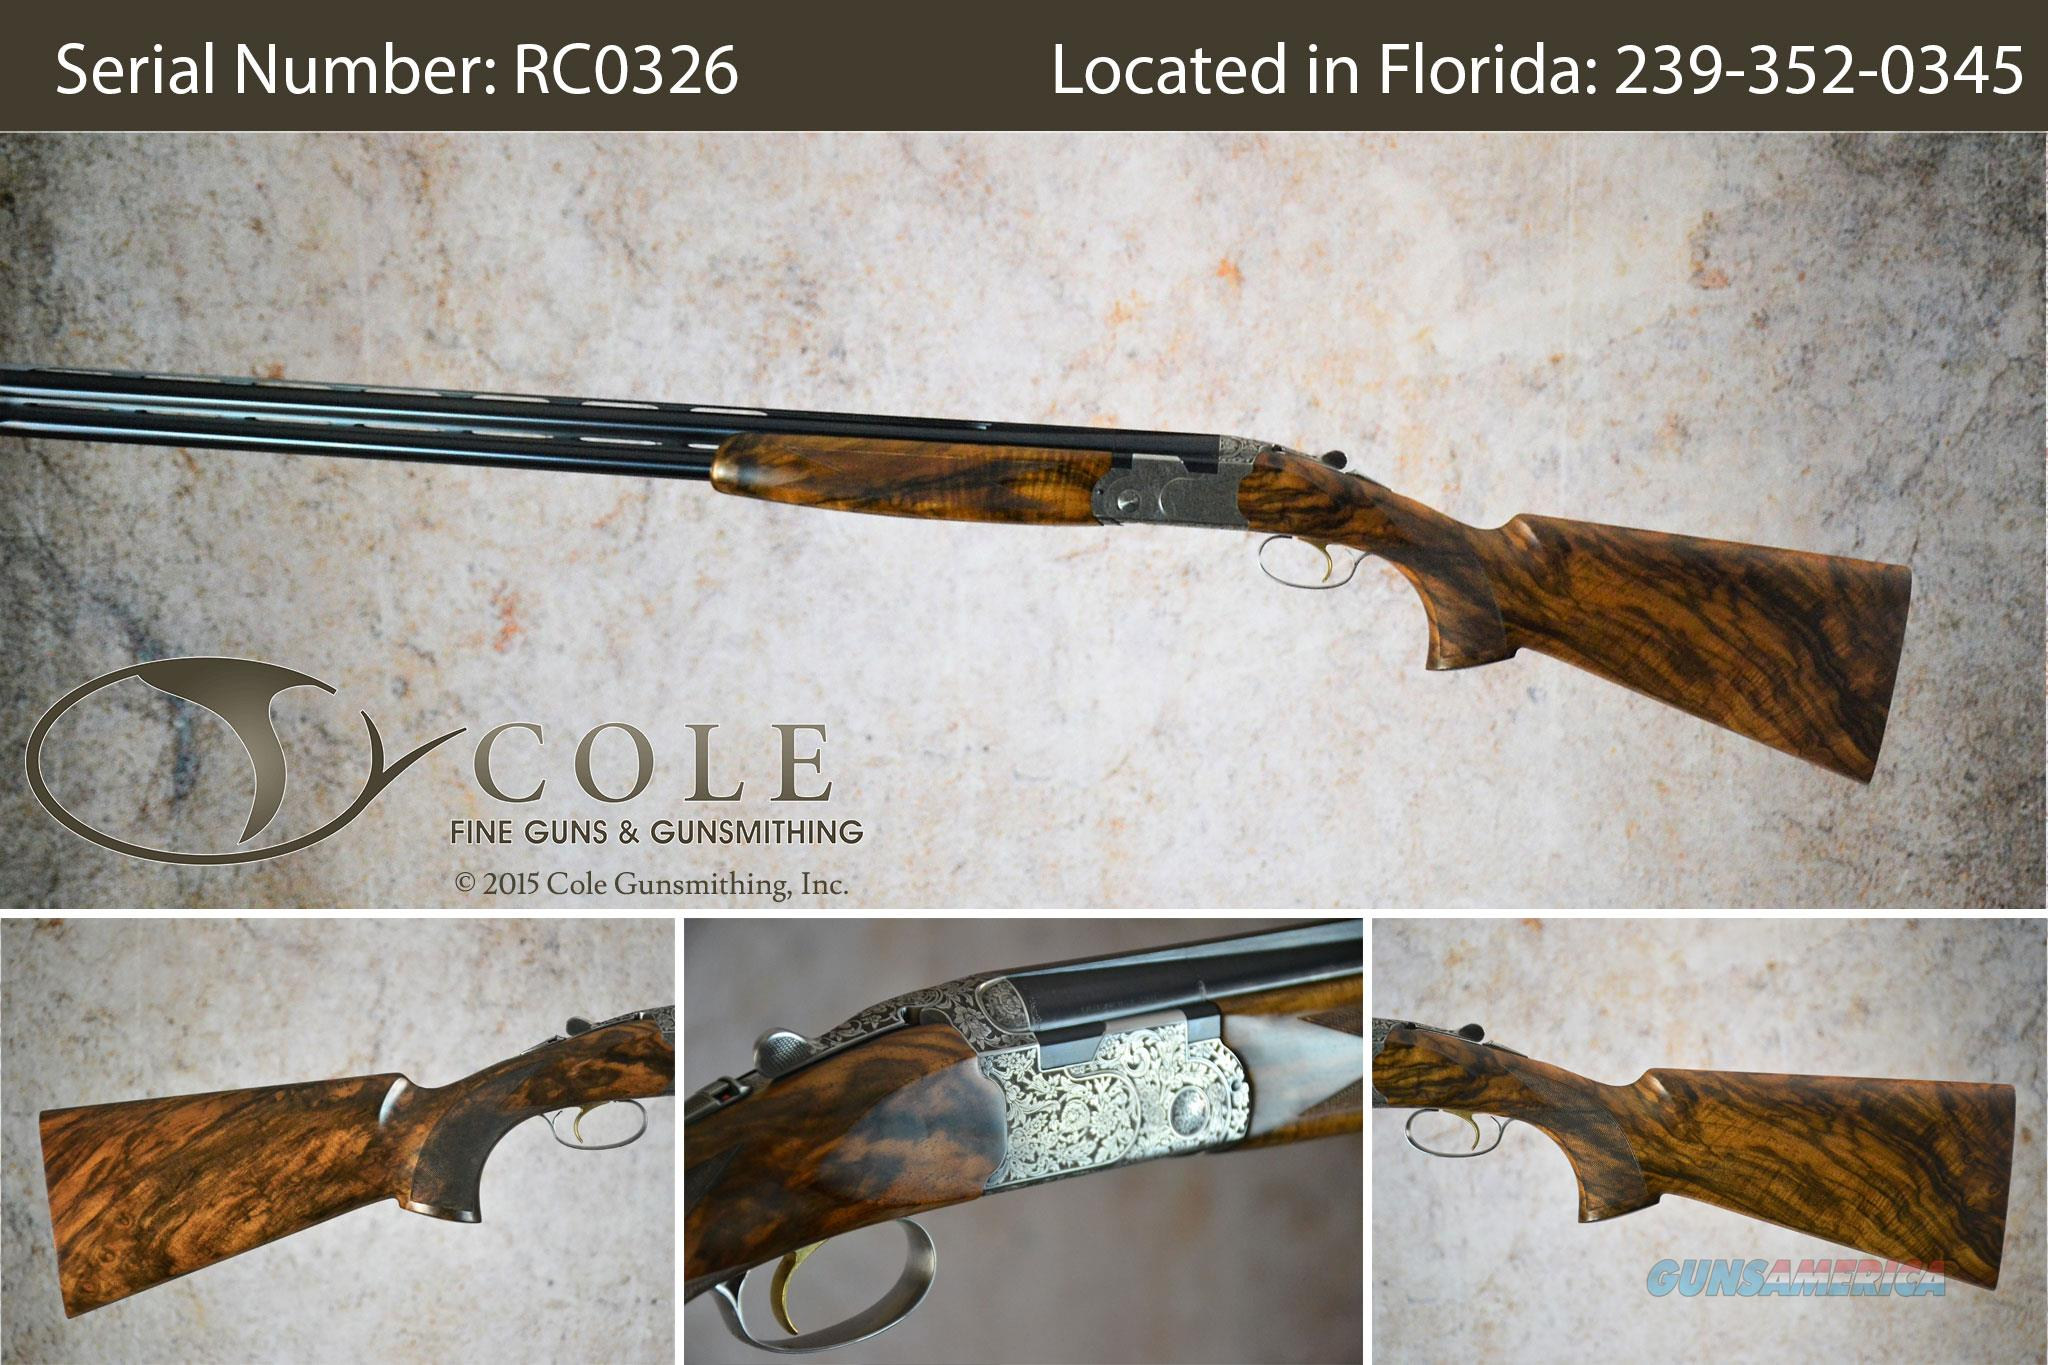 "Beretta 687 Cole Custom Sporting 12g 32"" SN:#RC0326  Guns > Shotguns > Beretta Shotguns > O/U > Trap/Skeet"